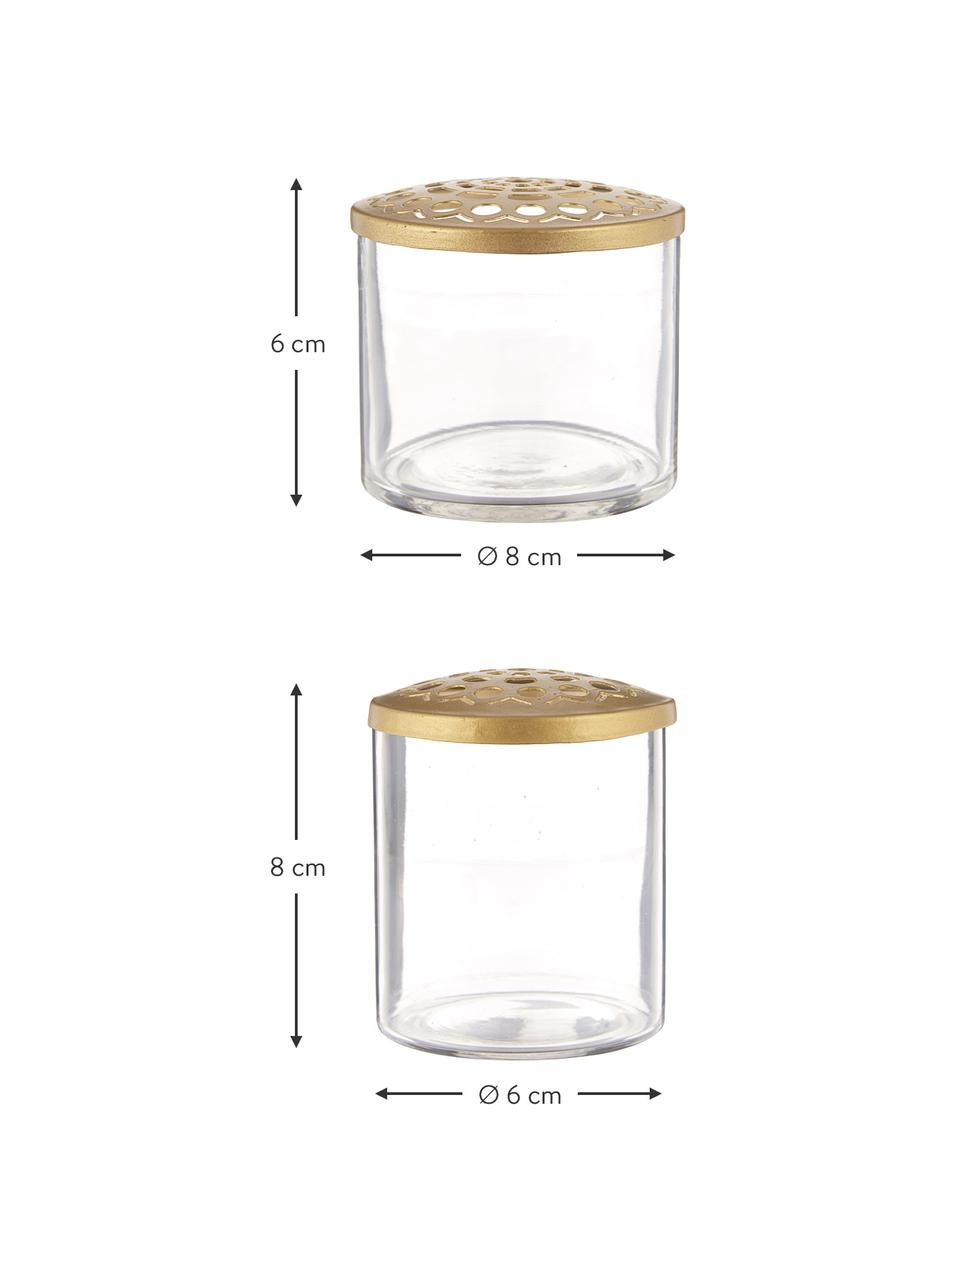 XS Vasen-Set Kastanje mit Metalldeckel, 2-tlg., Vase: Glas, Deckel: Edelstahl vermessingt, An, Vase: Transparent Deckel: Messing, Sondergrößen